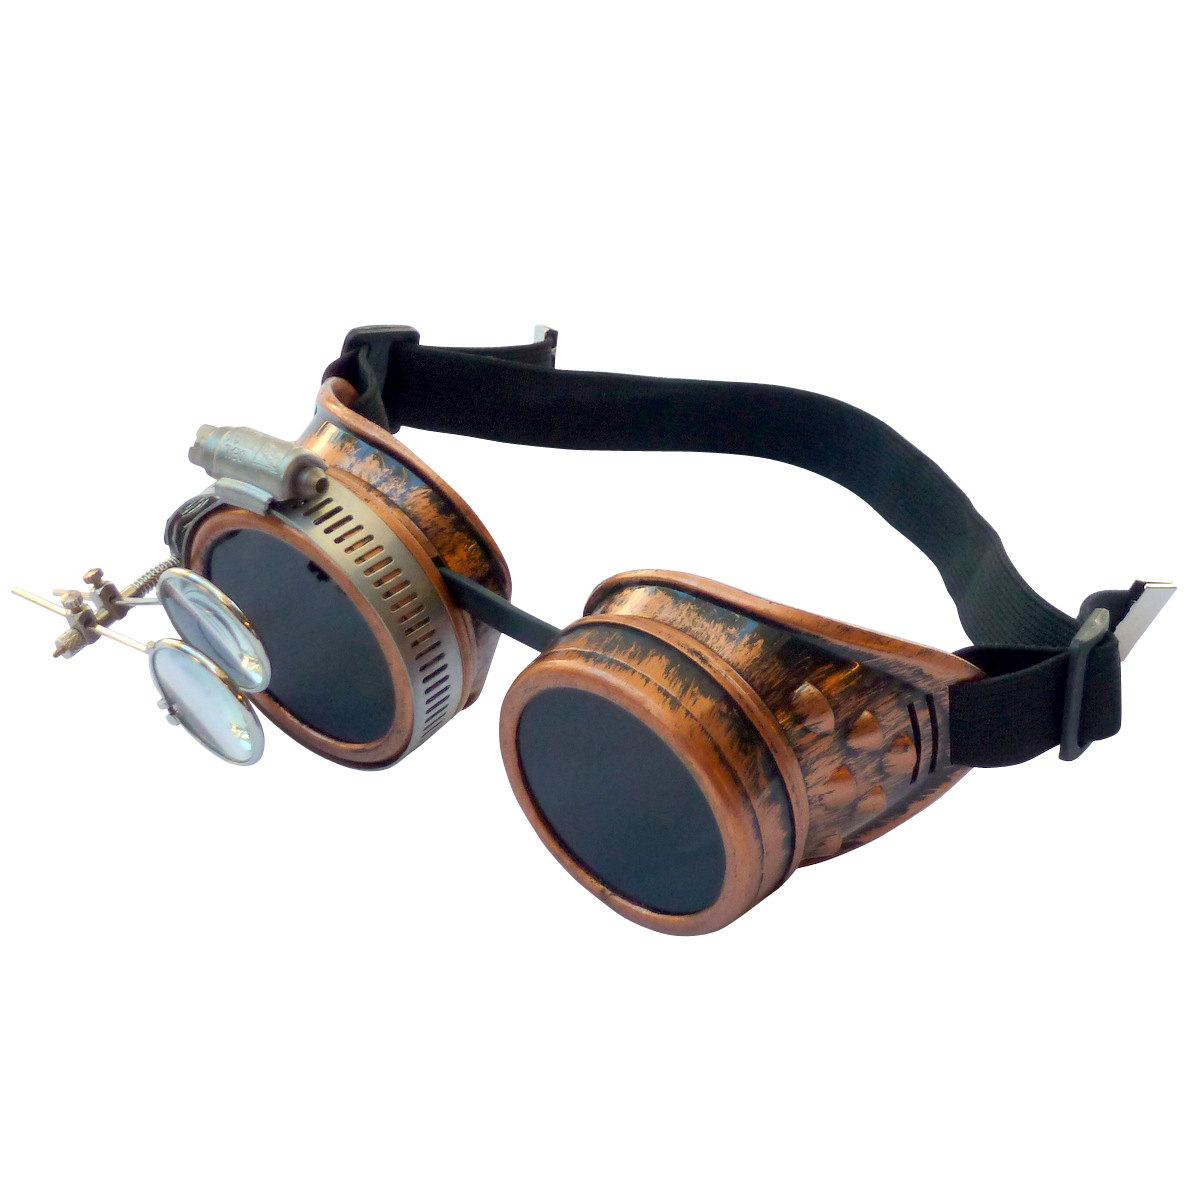 Copper Toned Goggles: Dark Lenses /w Eye Loupe